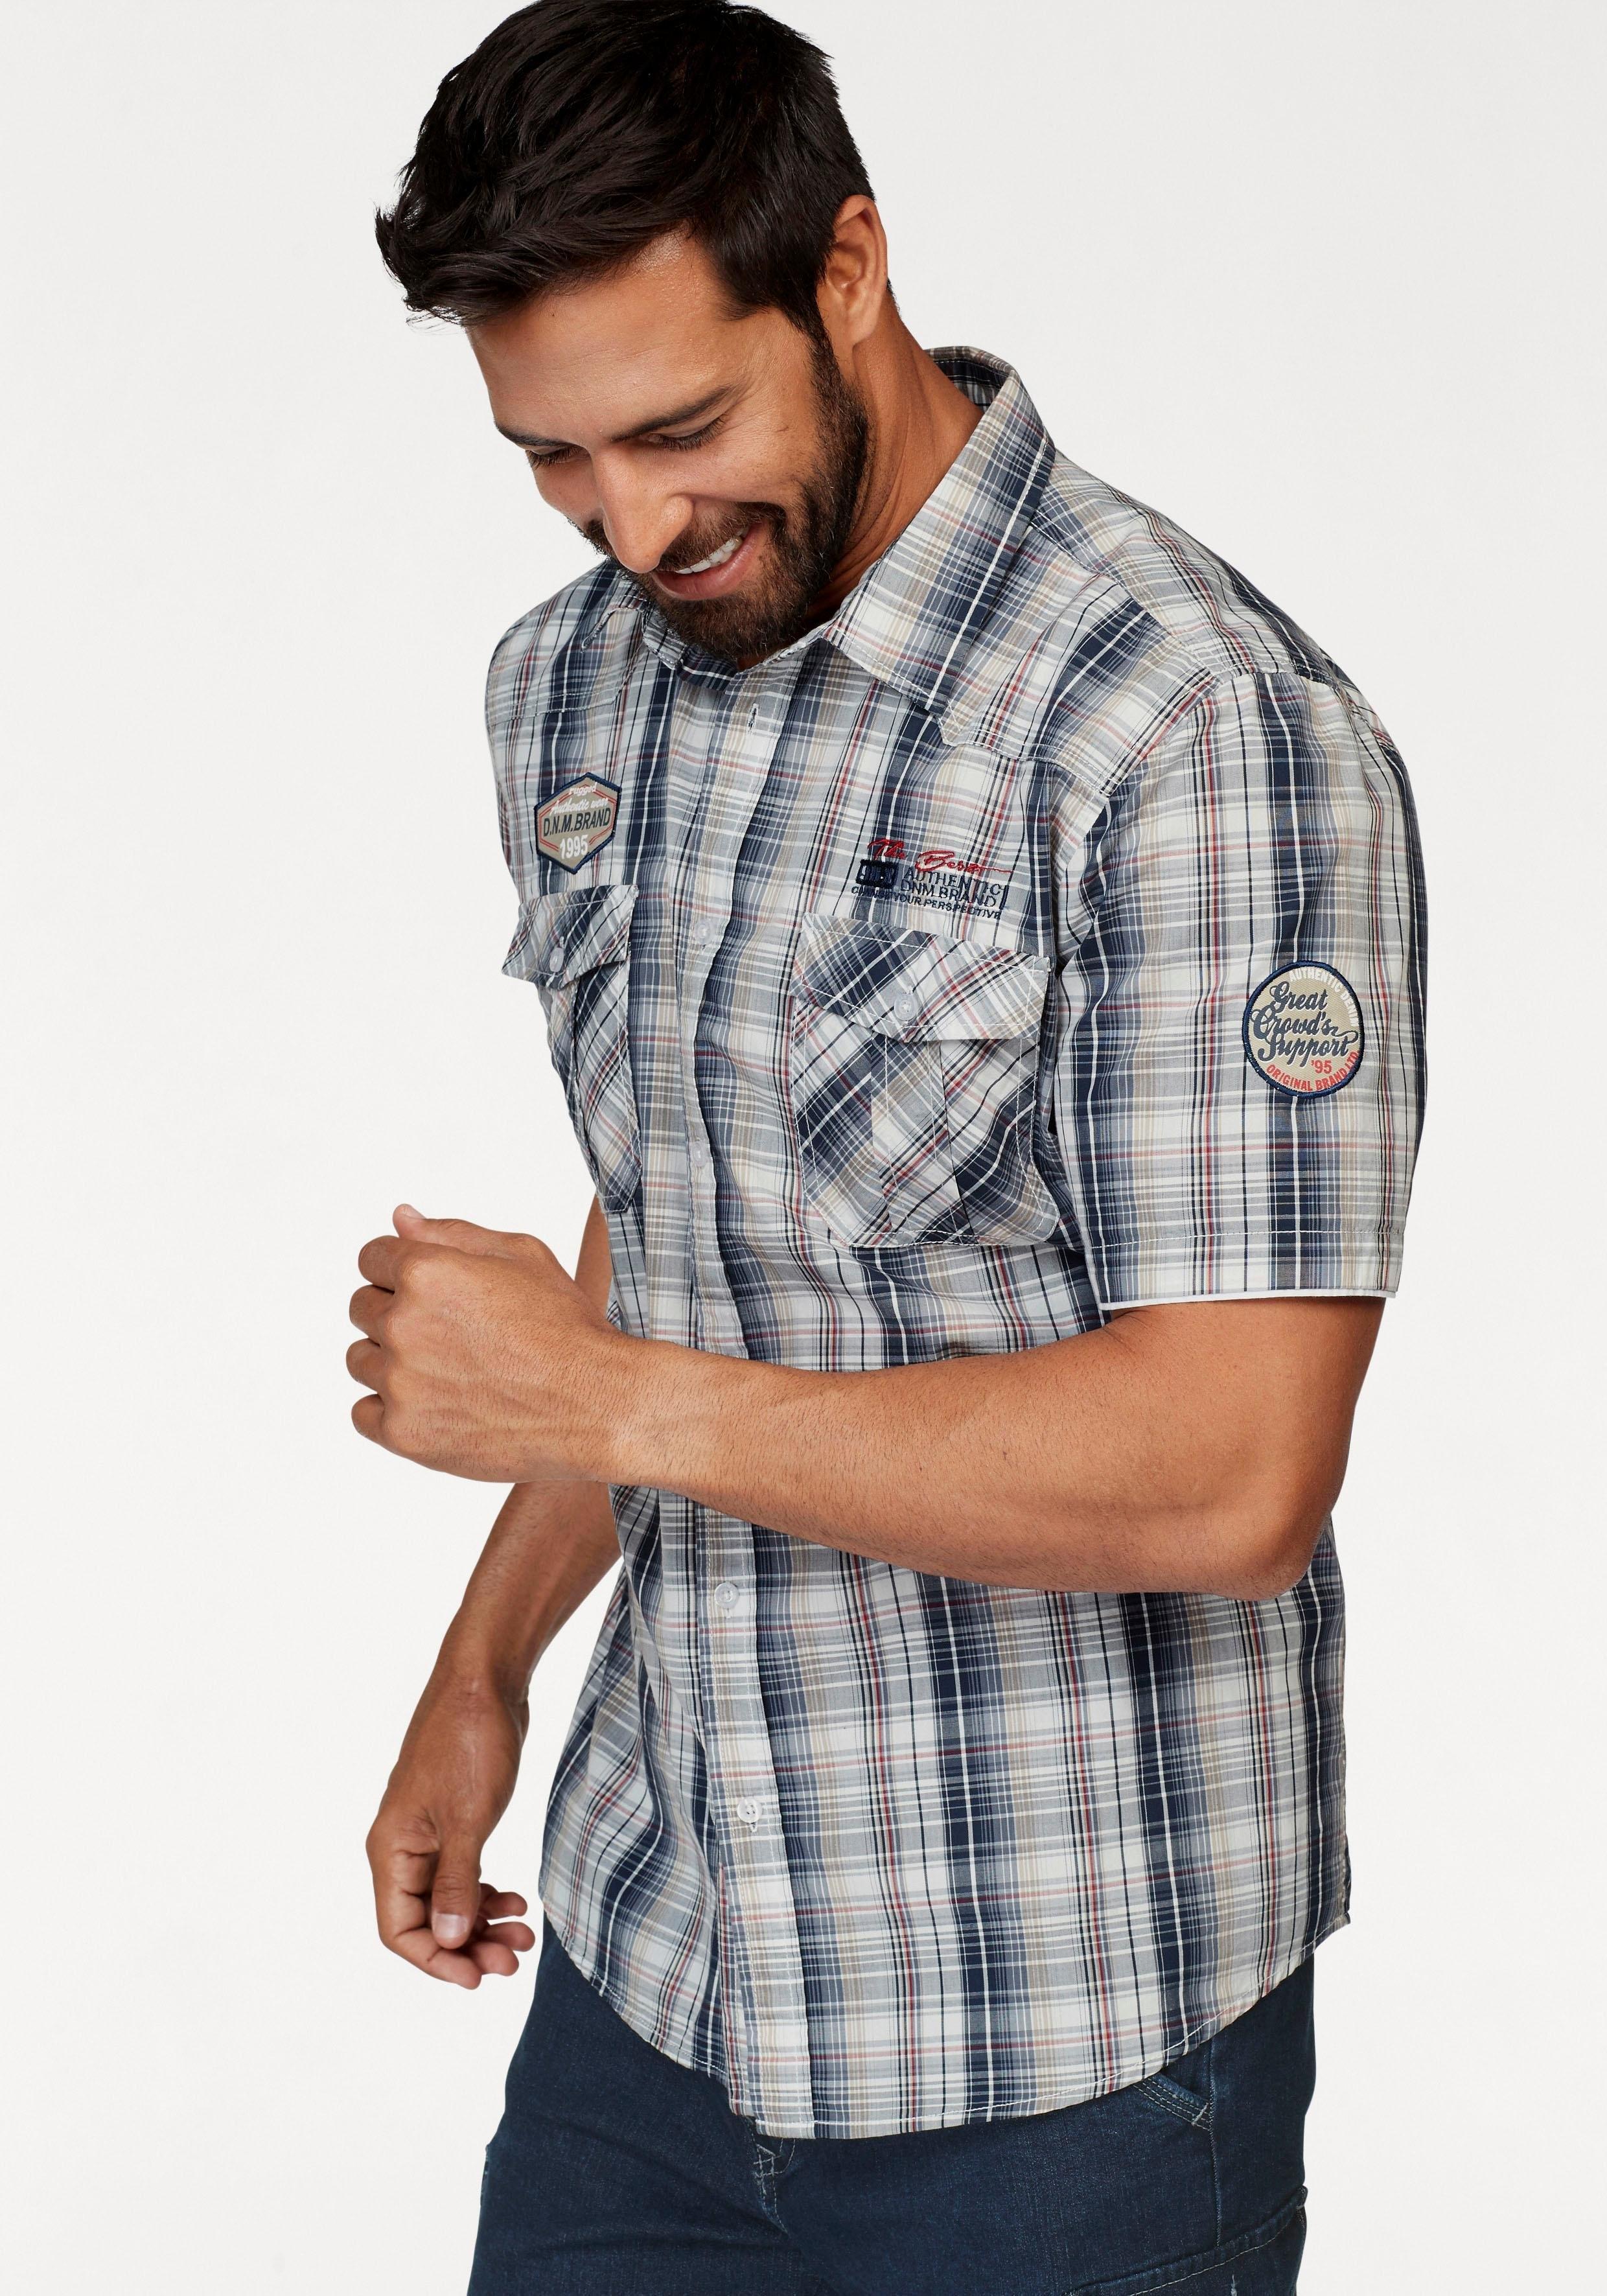 Korte Mouw Overhemd Mannen.Man S World Overhemd Met Korte Mouwen Online Bestellen Otto